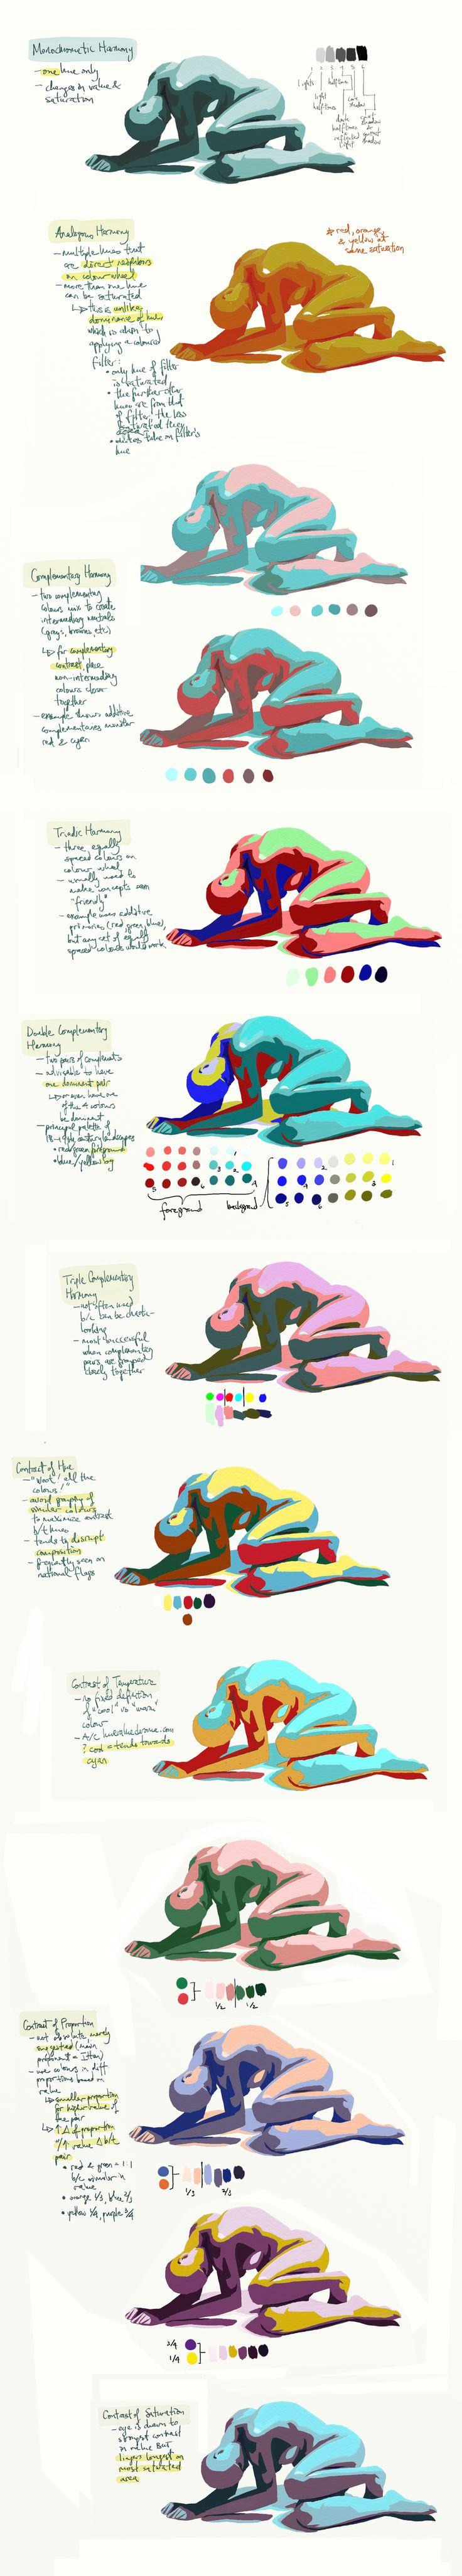 Colour Harmonies and Contrasts by theThirdCartel.deviantart.com on @DeviantArt